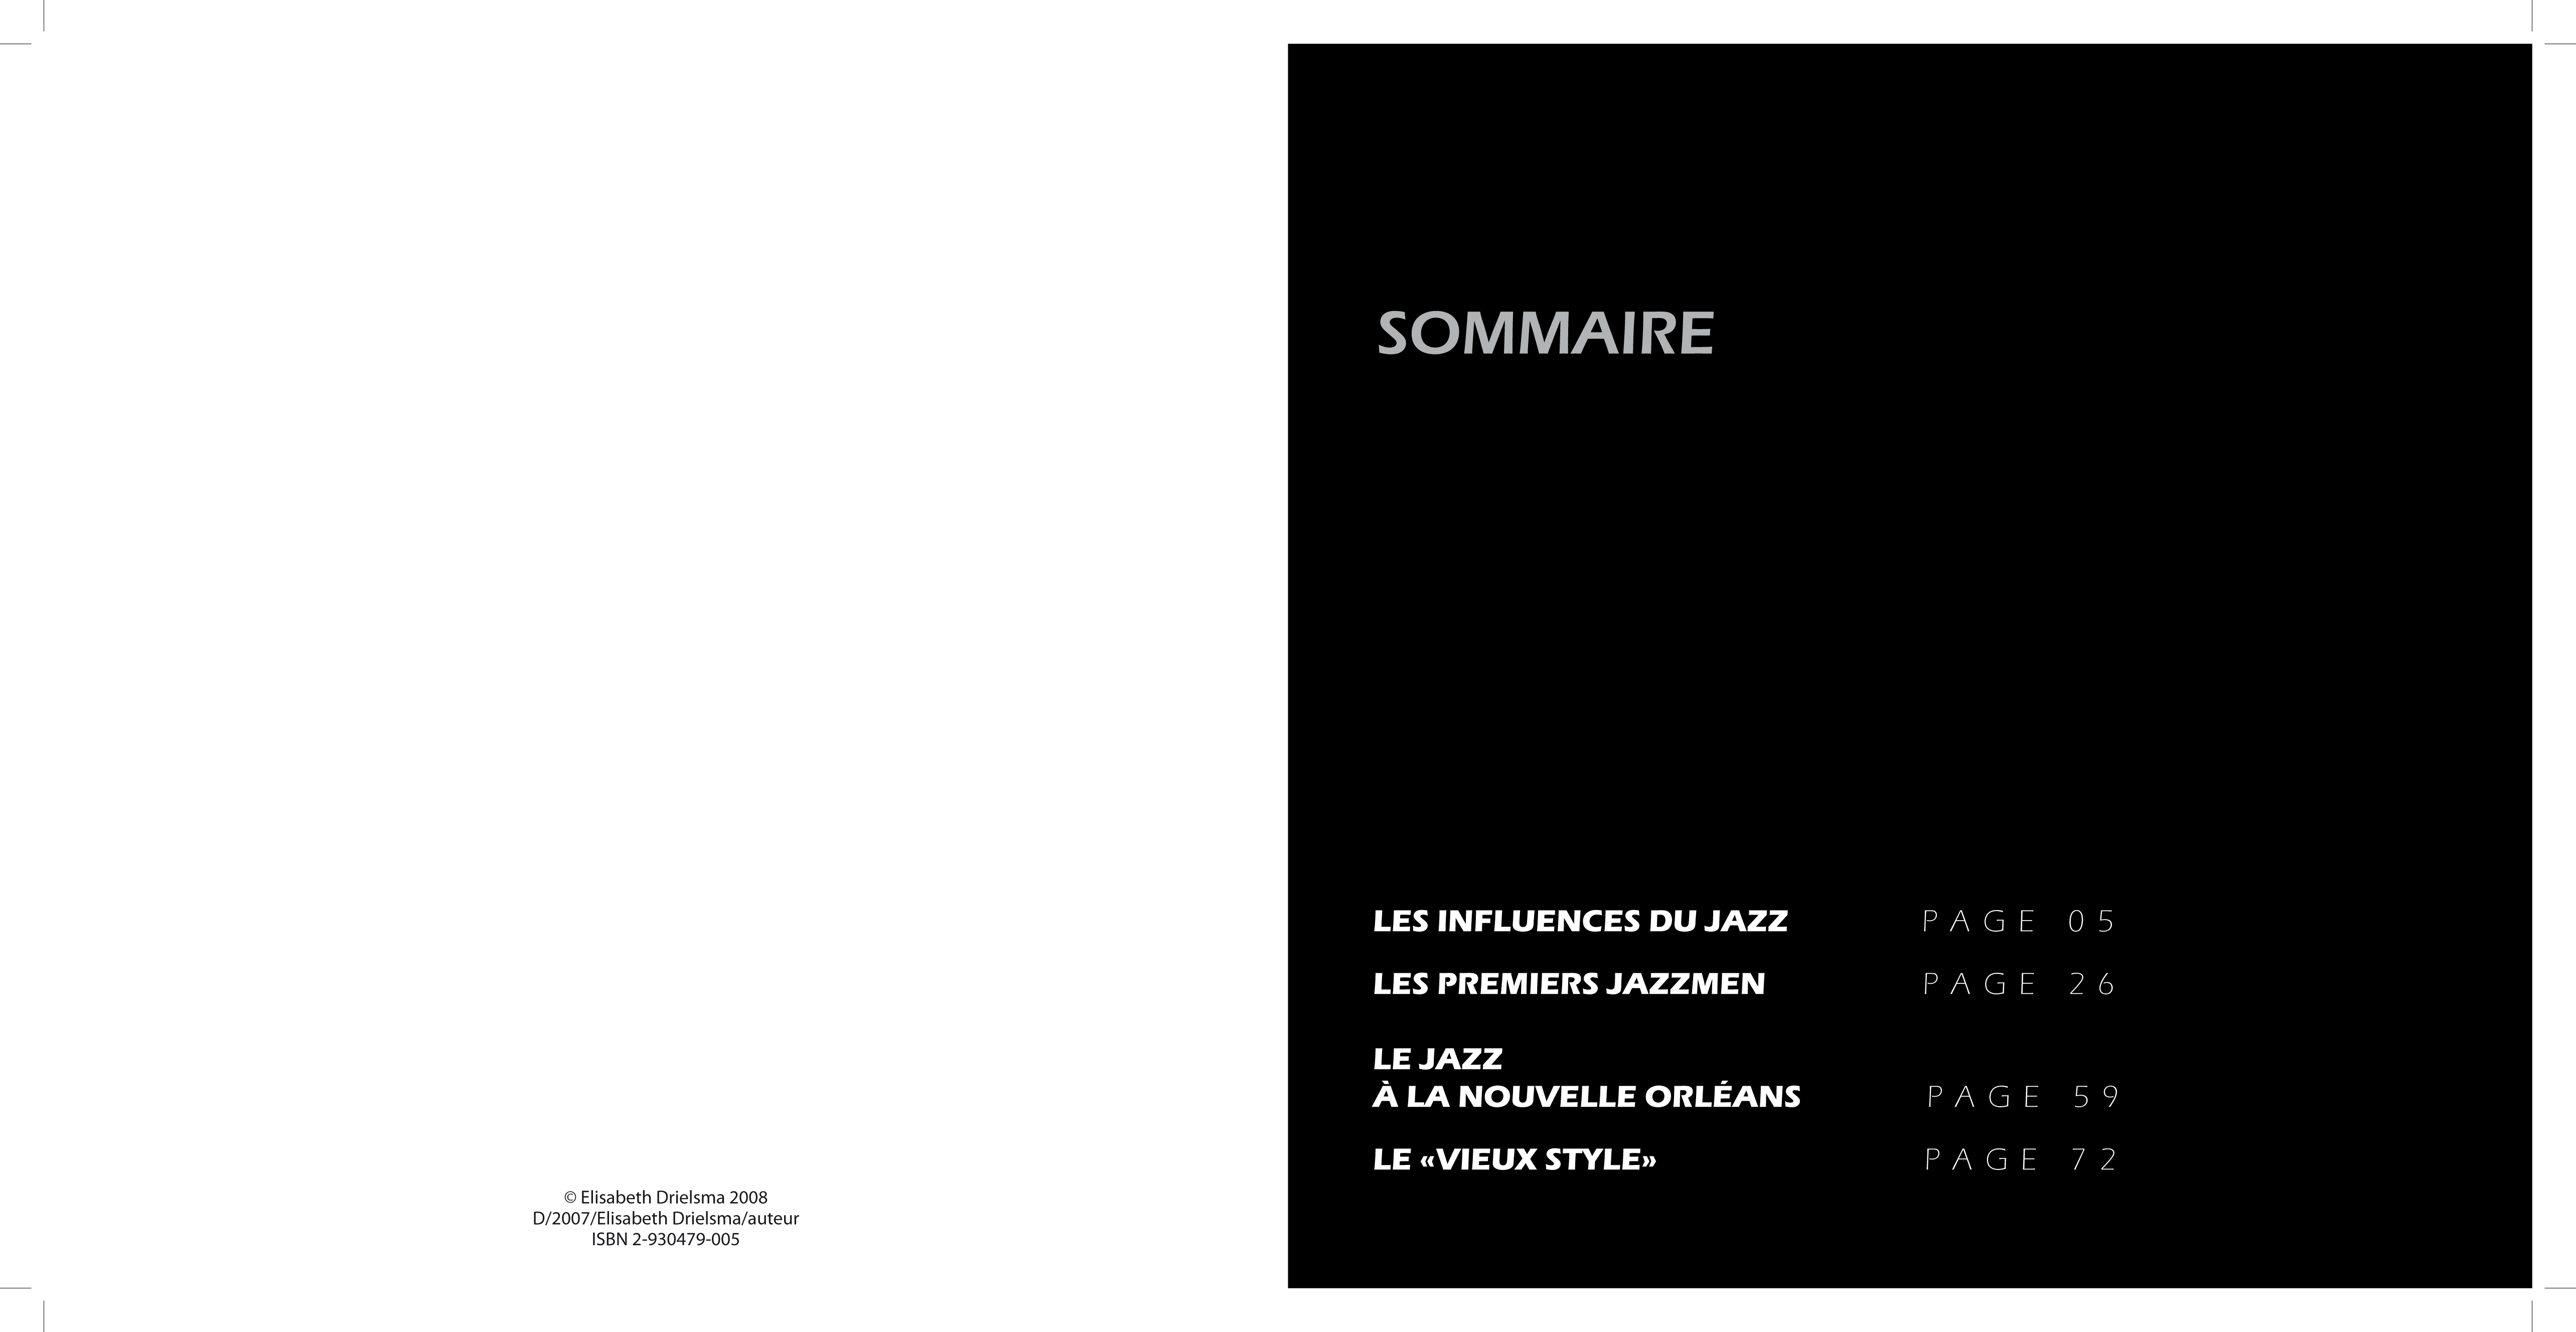 jazz mise en page1-4